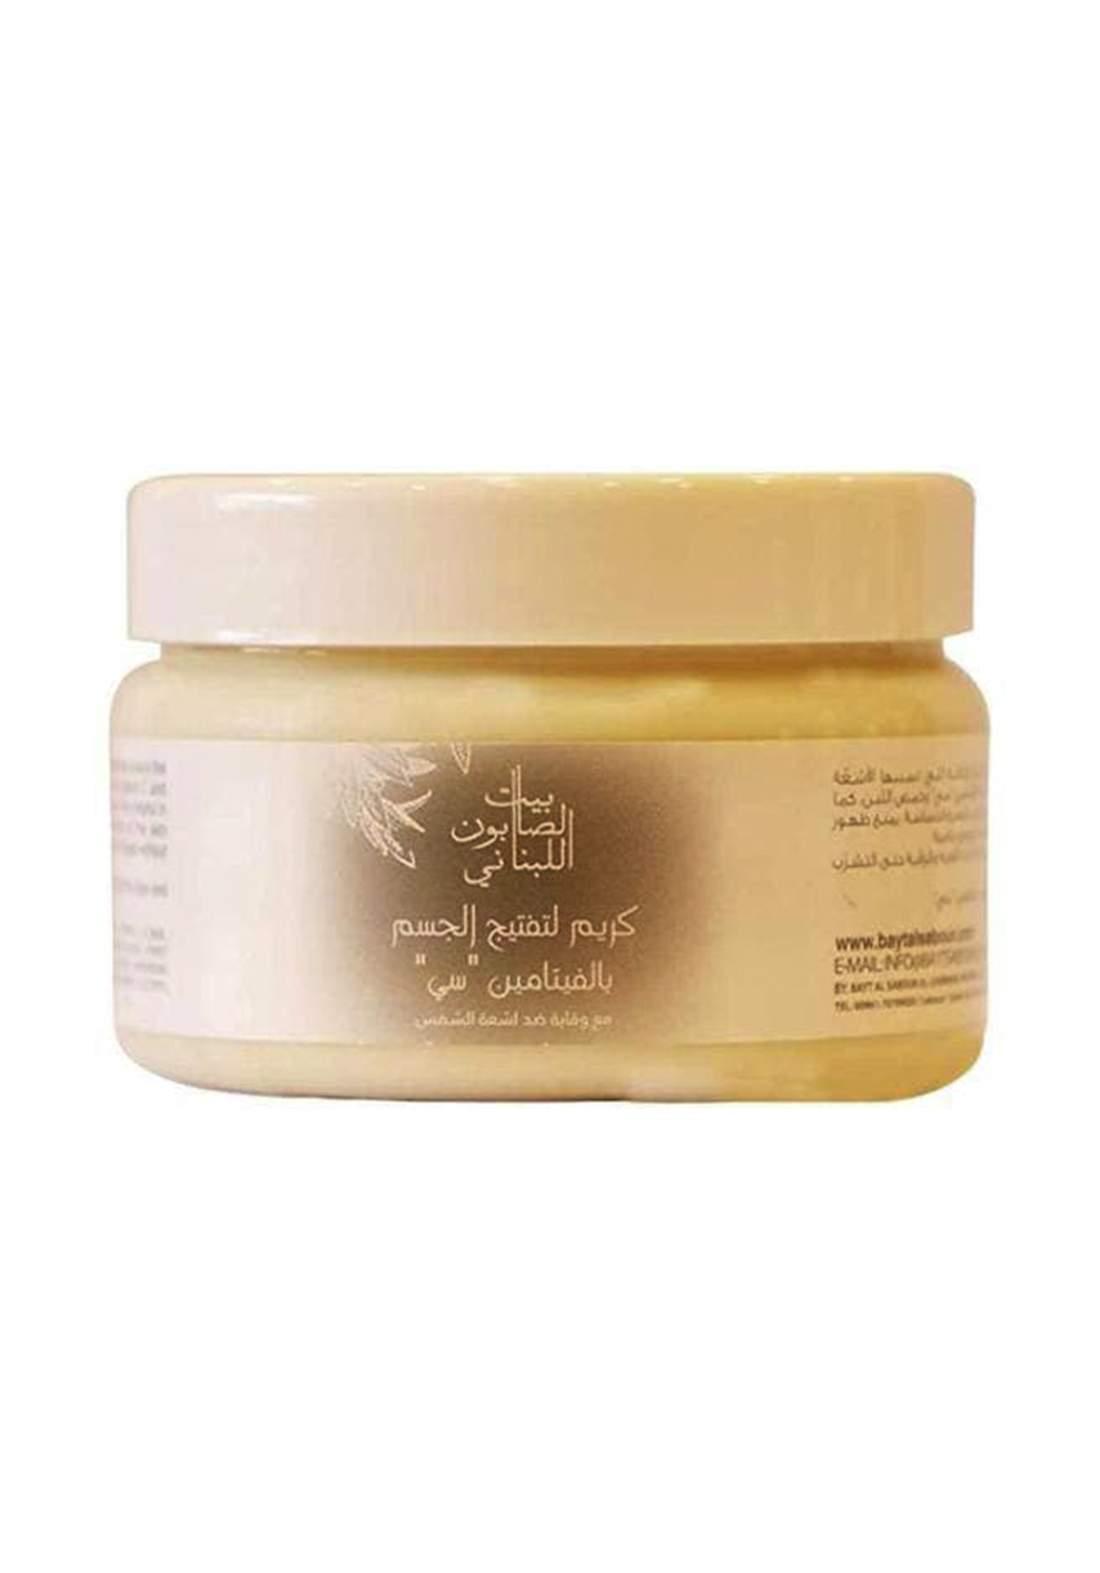 Bayt Alsaboun Alloubnani-317496 Whitening Facial Cream Vitamin C 150g كريم